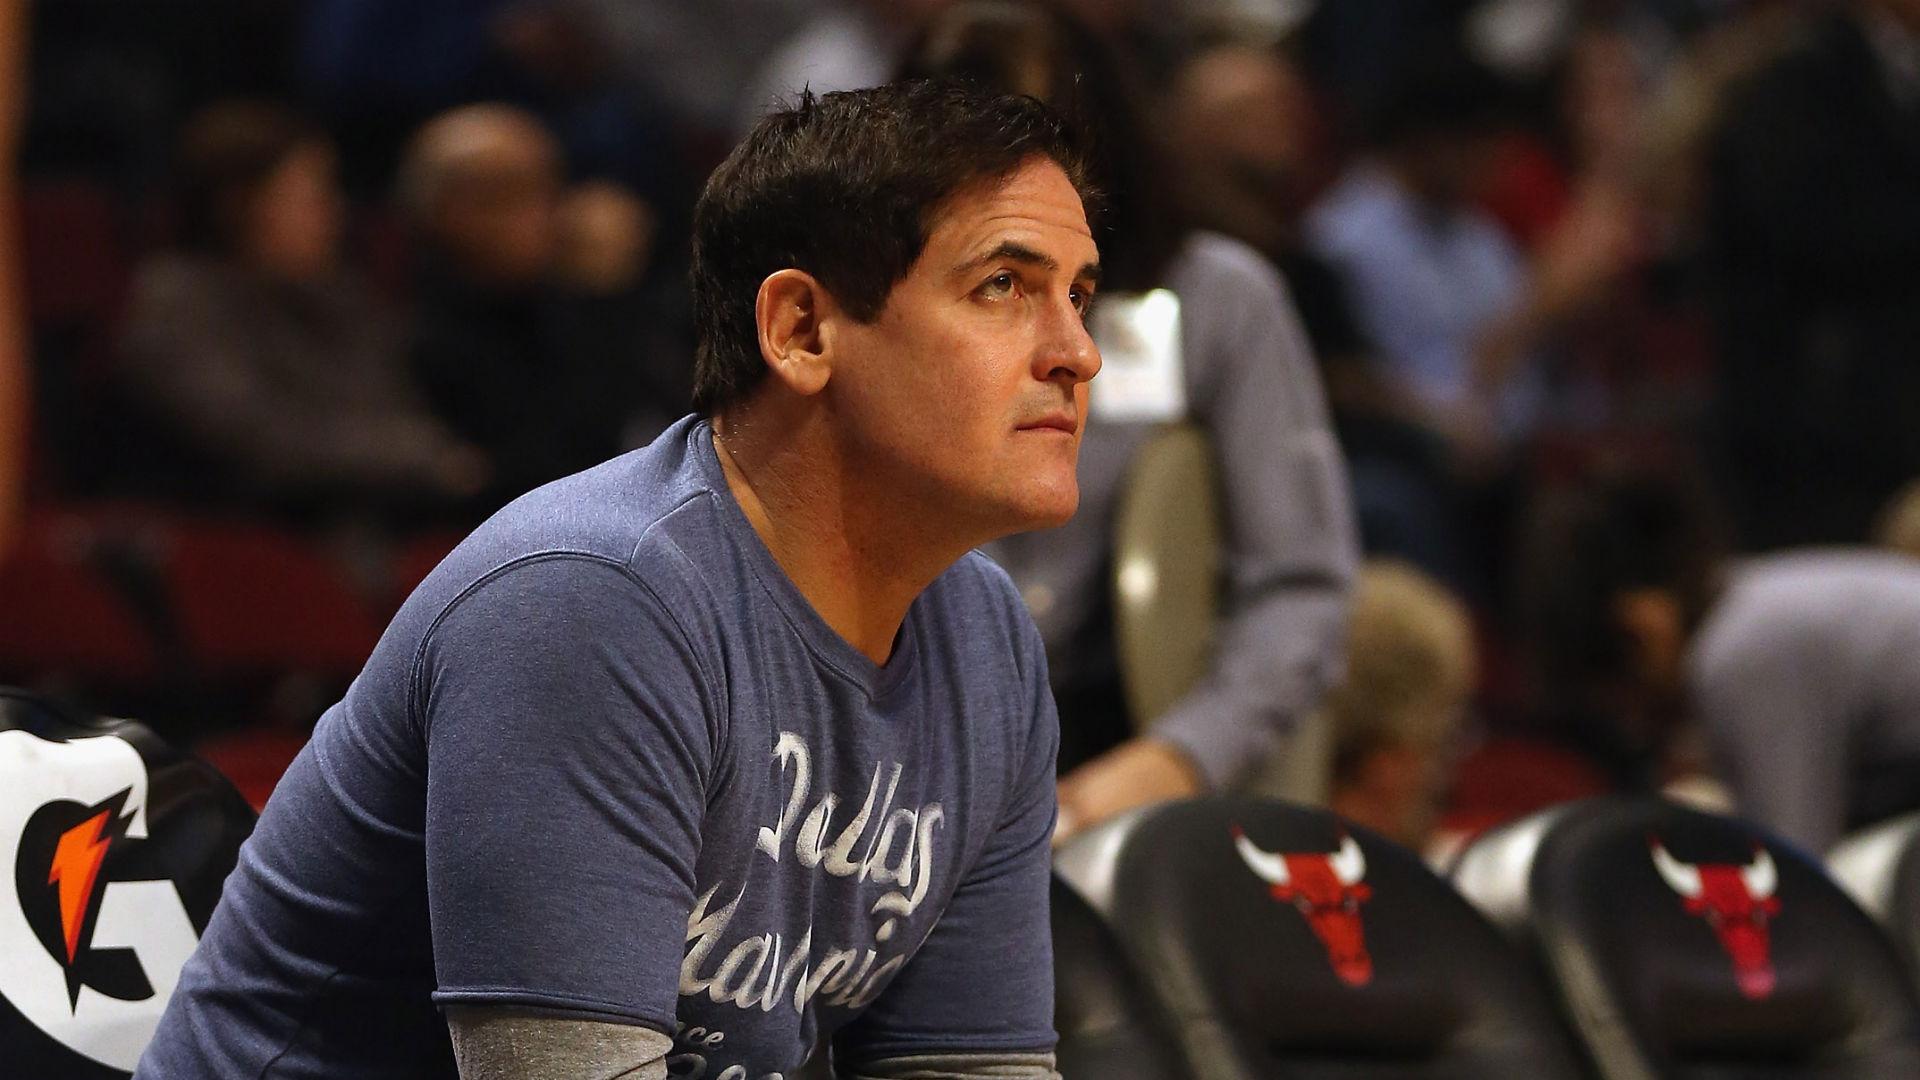 Mark Cuban teases Donald Trump again at NBA Celebrity All-Star Game